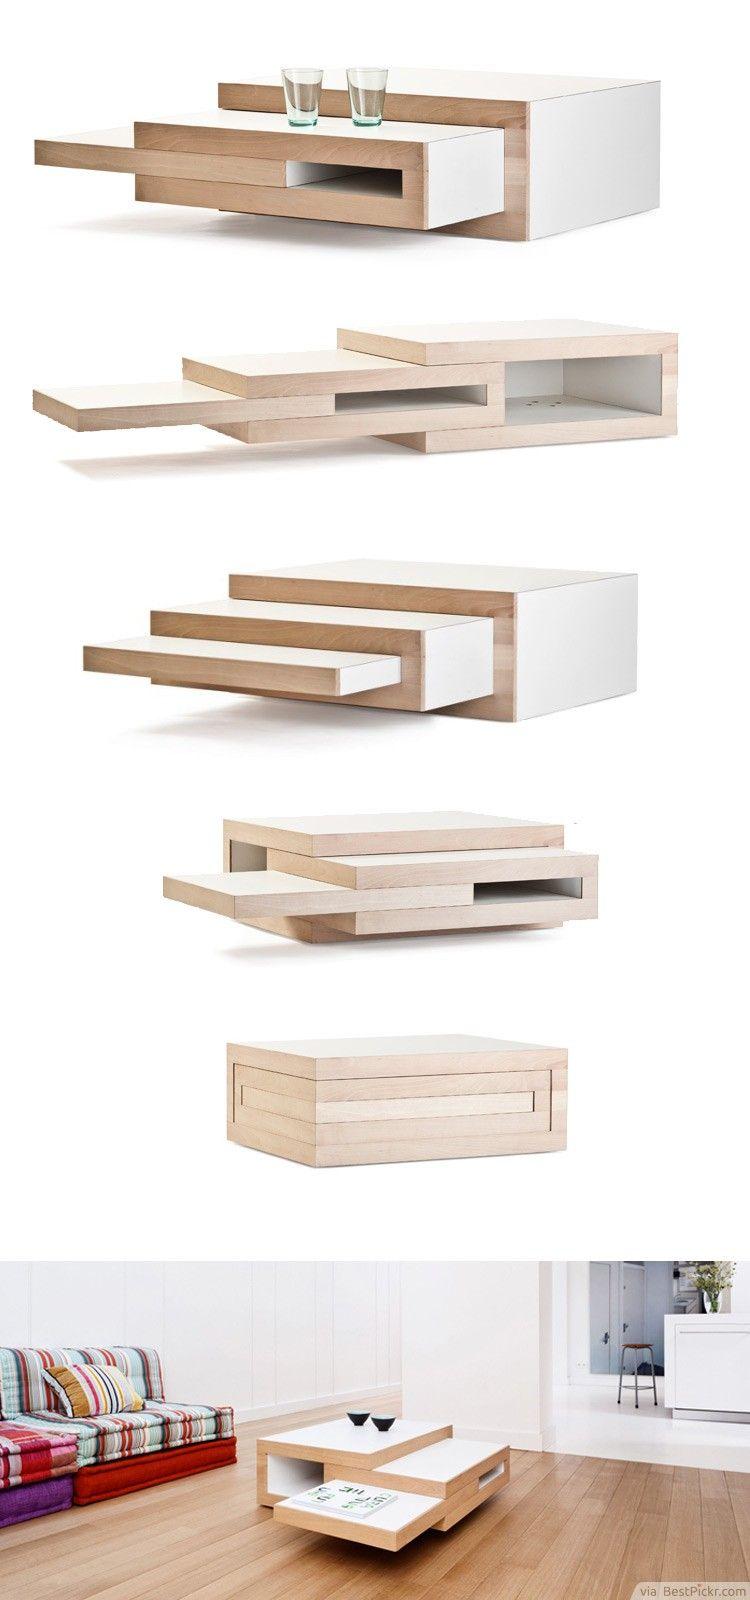 Amazing REK: Expandable Transformer Wooden Coffee Table ❥❥❥ Http://bestpickr. Amazing Design